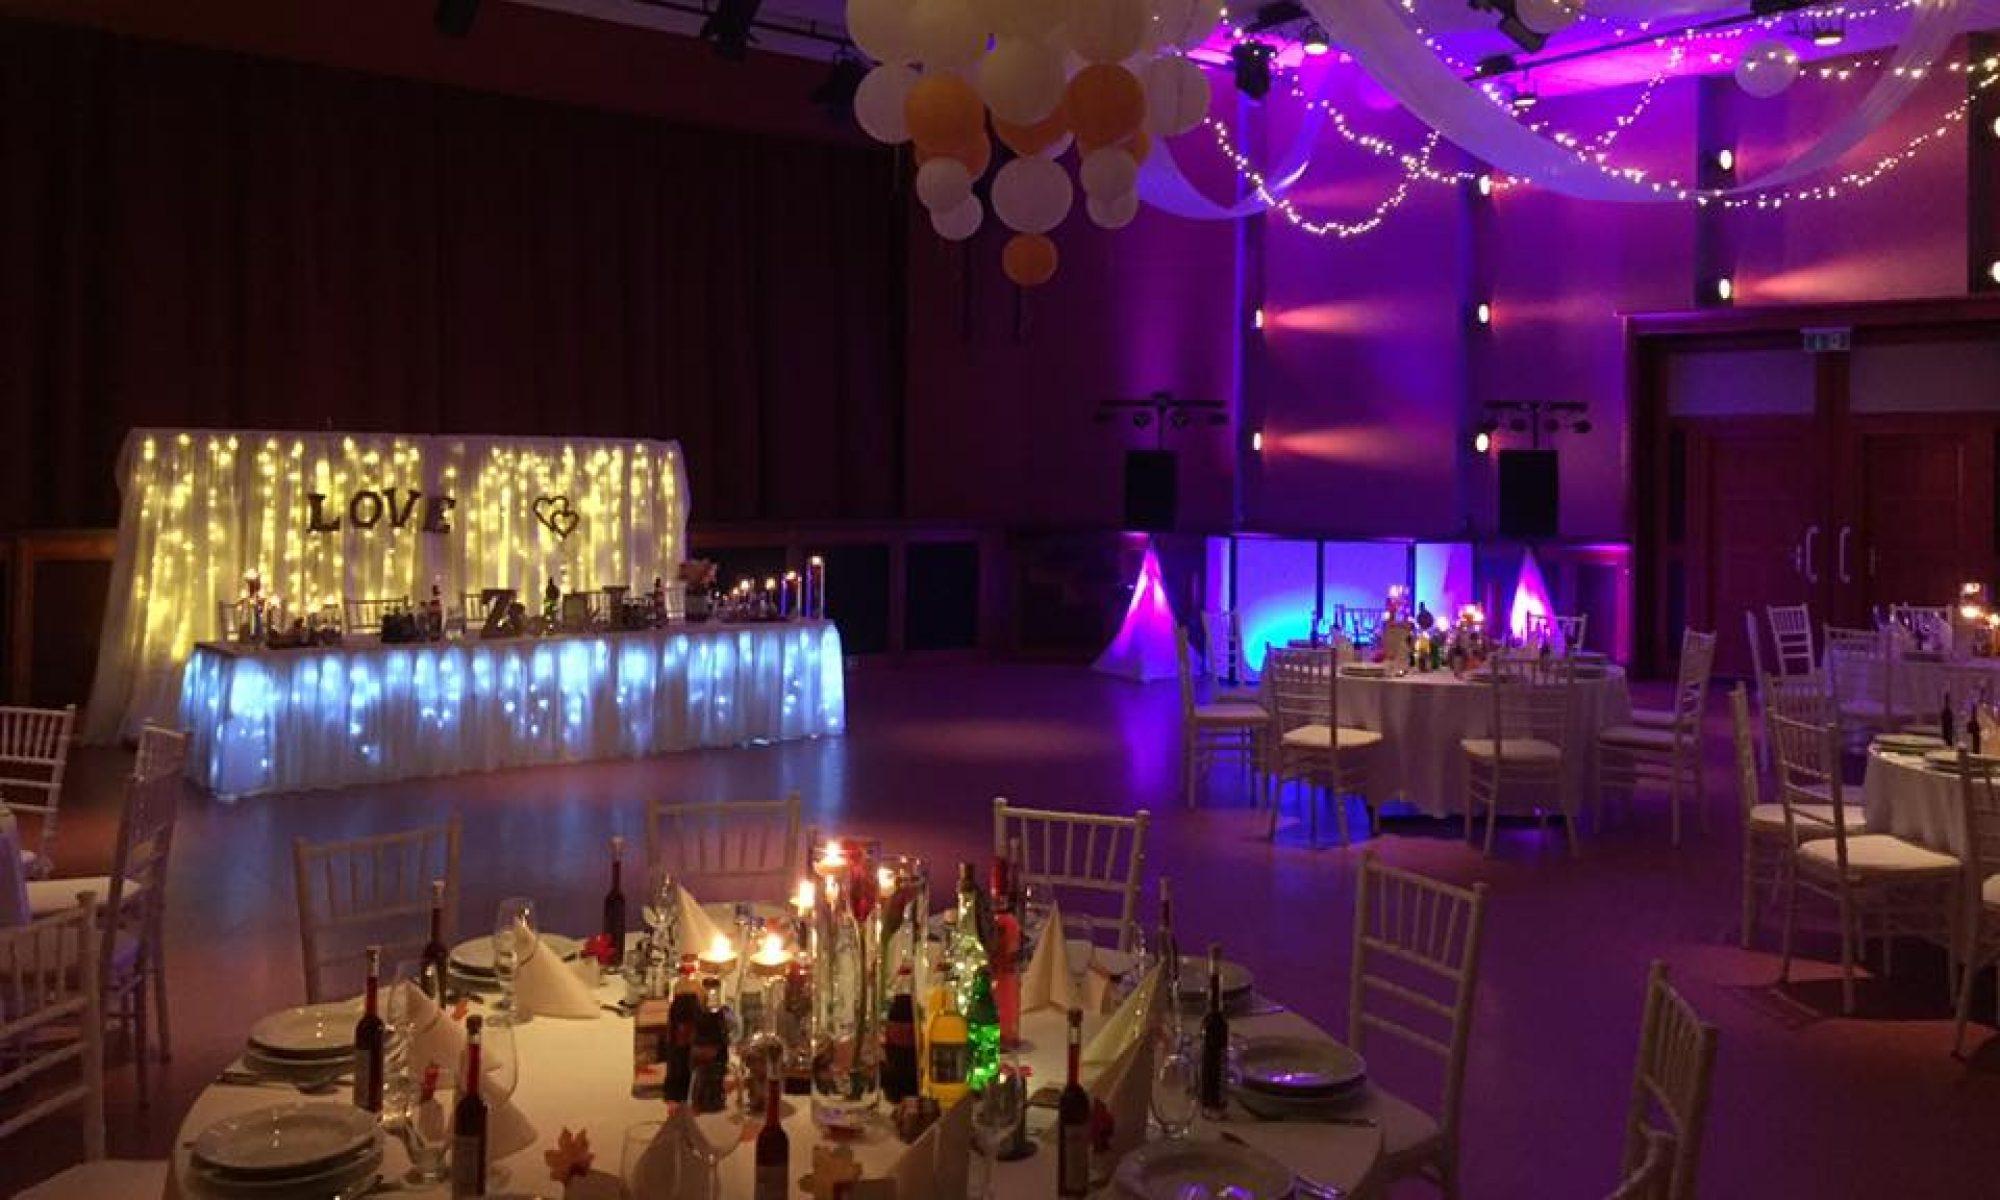 Retro Djk esküvőre